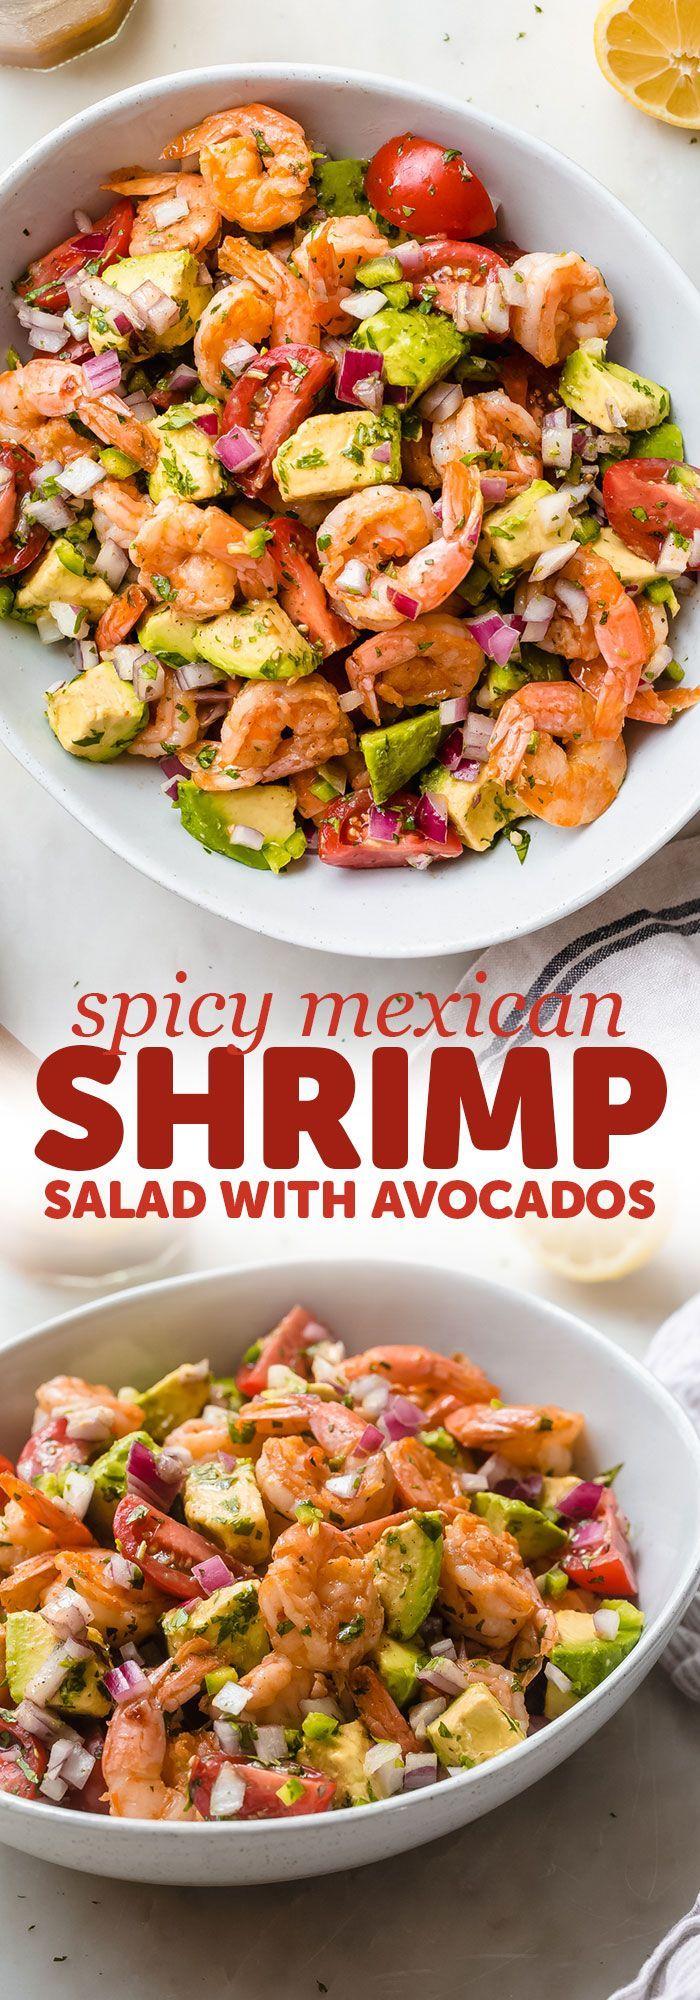 Spicy Mexican Shrimp Salad Recipe   Little Spice Jar